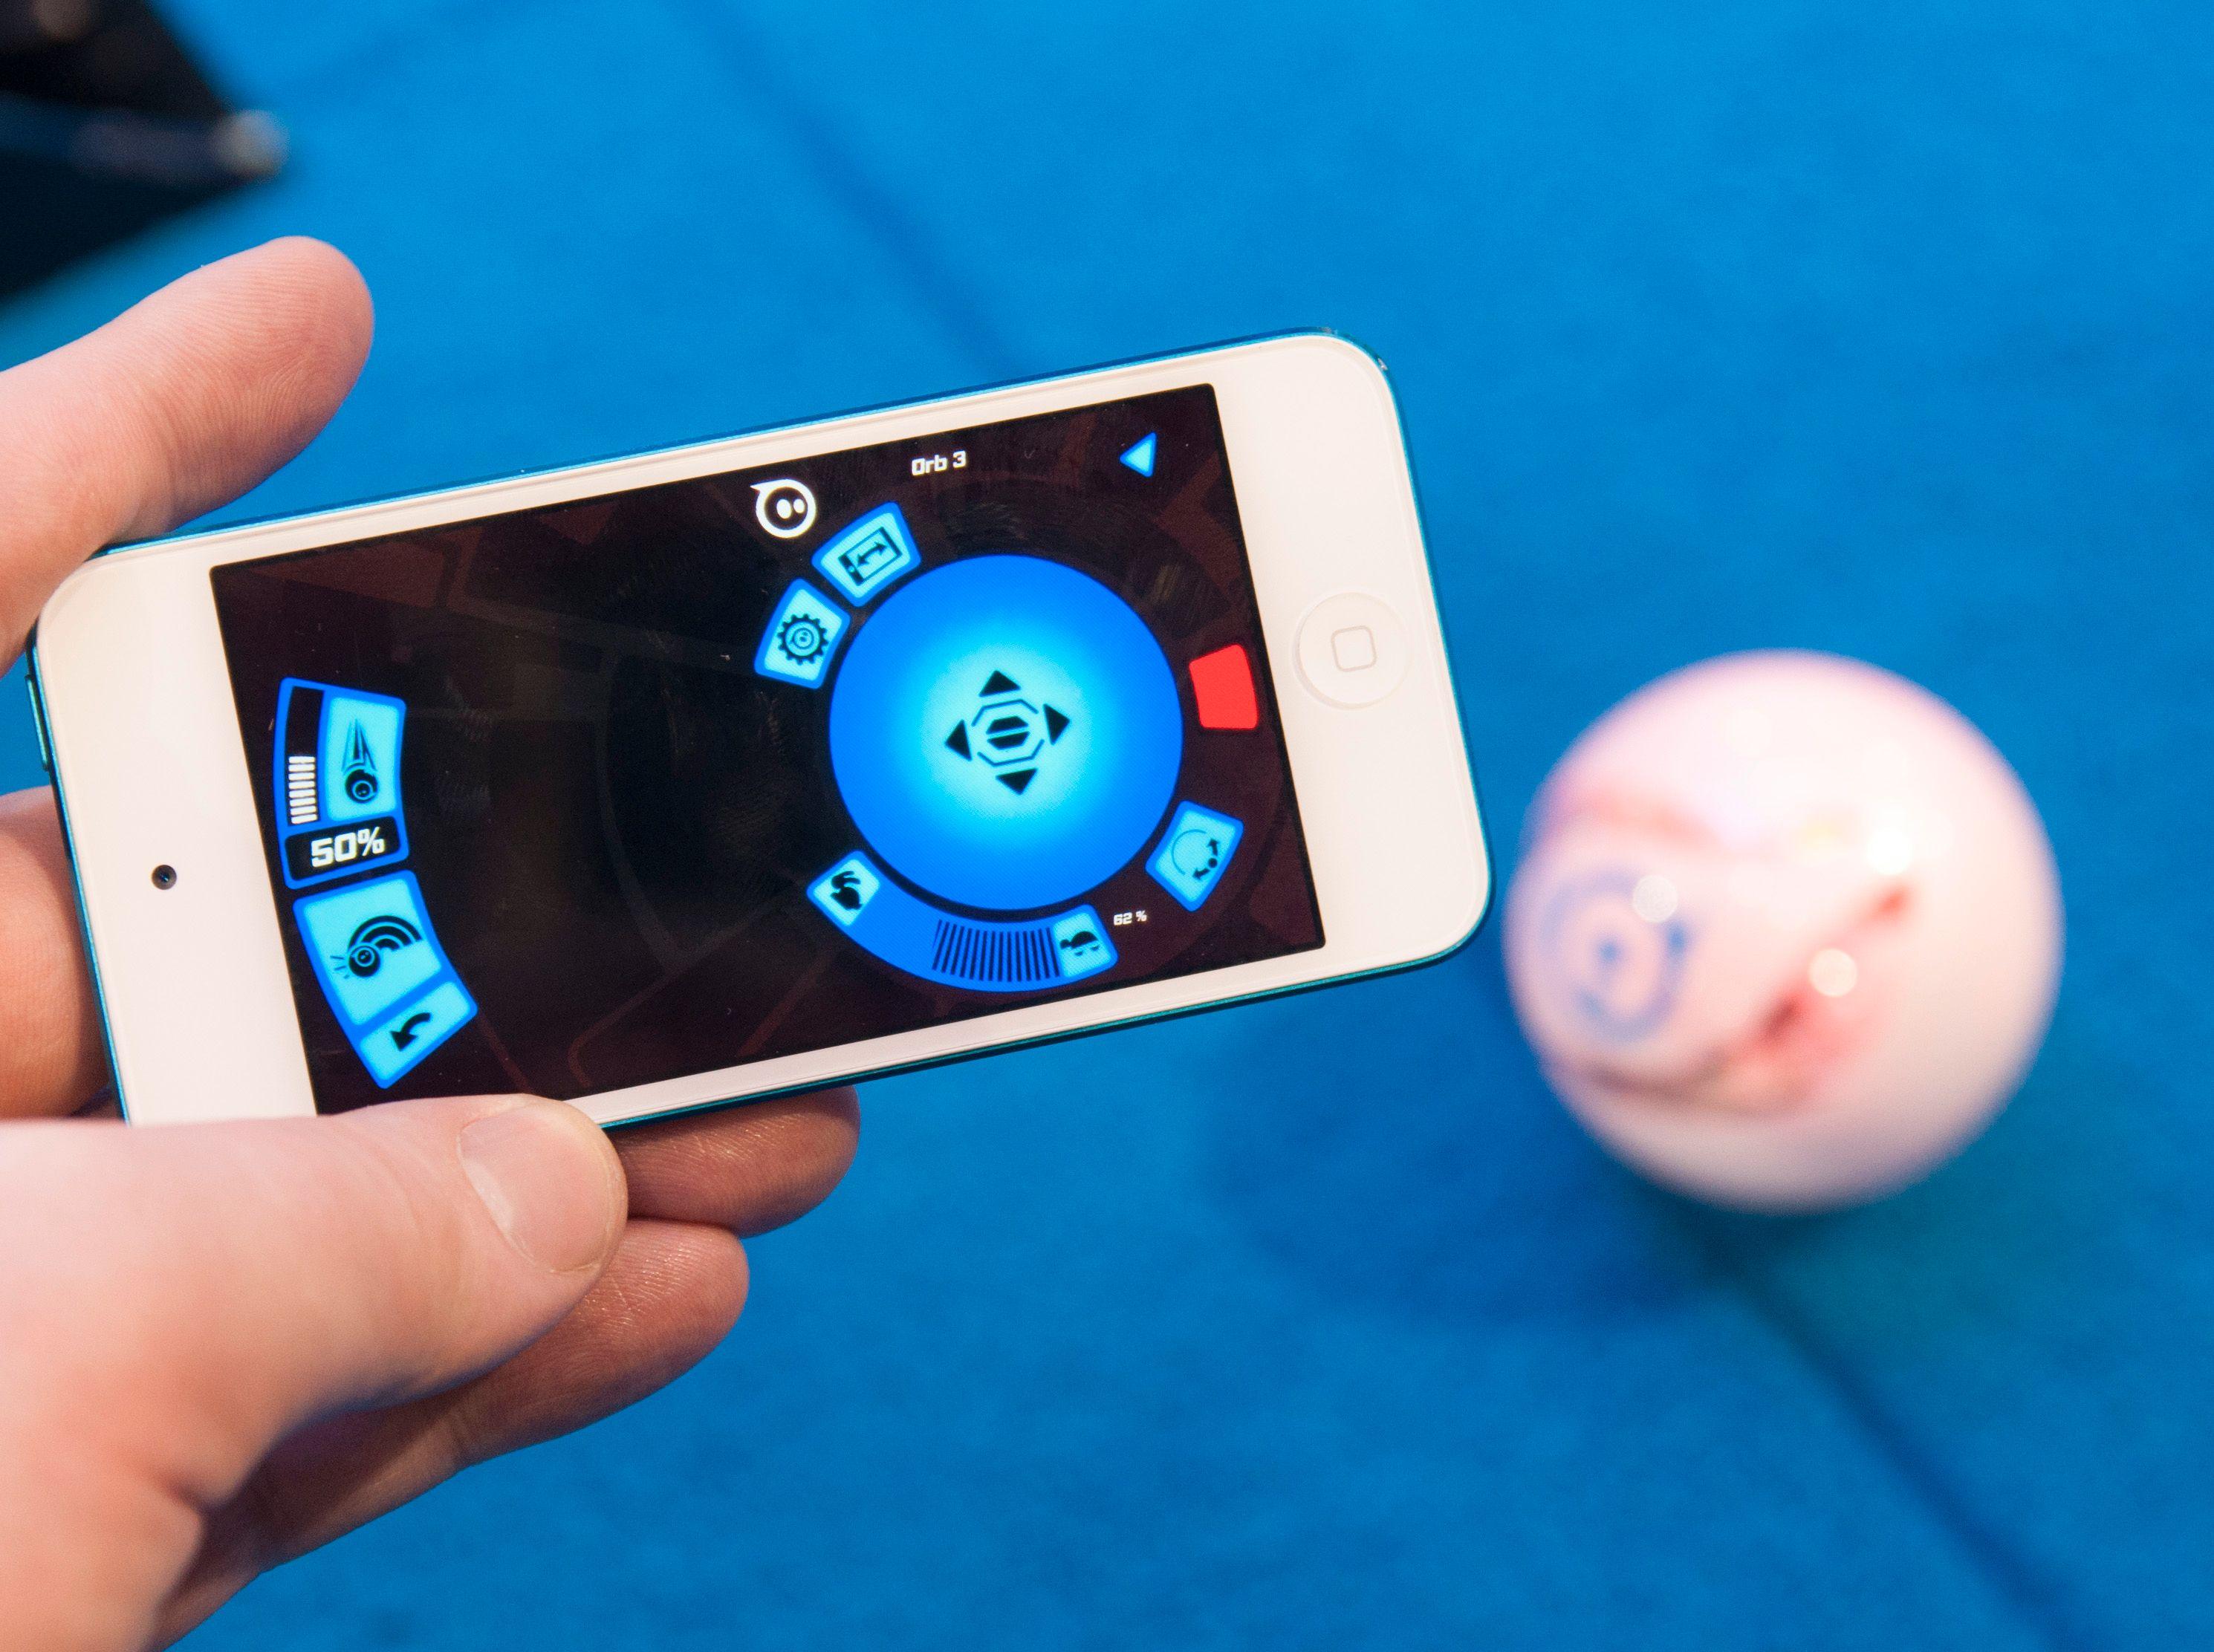 Slik ser Orbotix-appen ut nå.Foto: Finn Jarle Kvalheim, Amobil.no